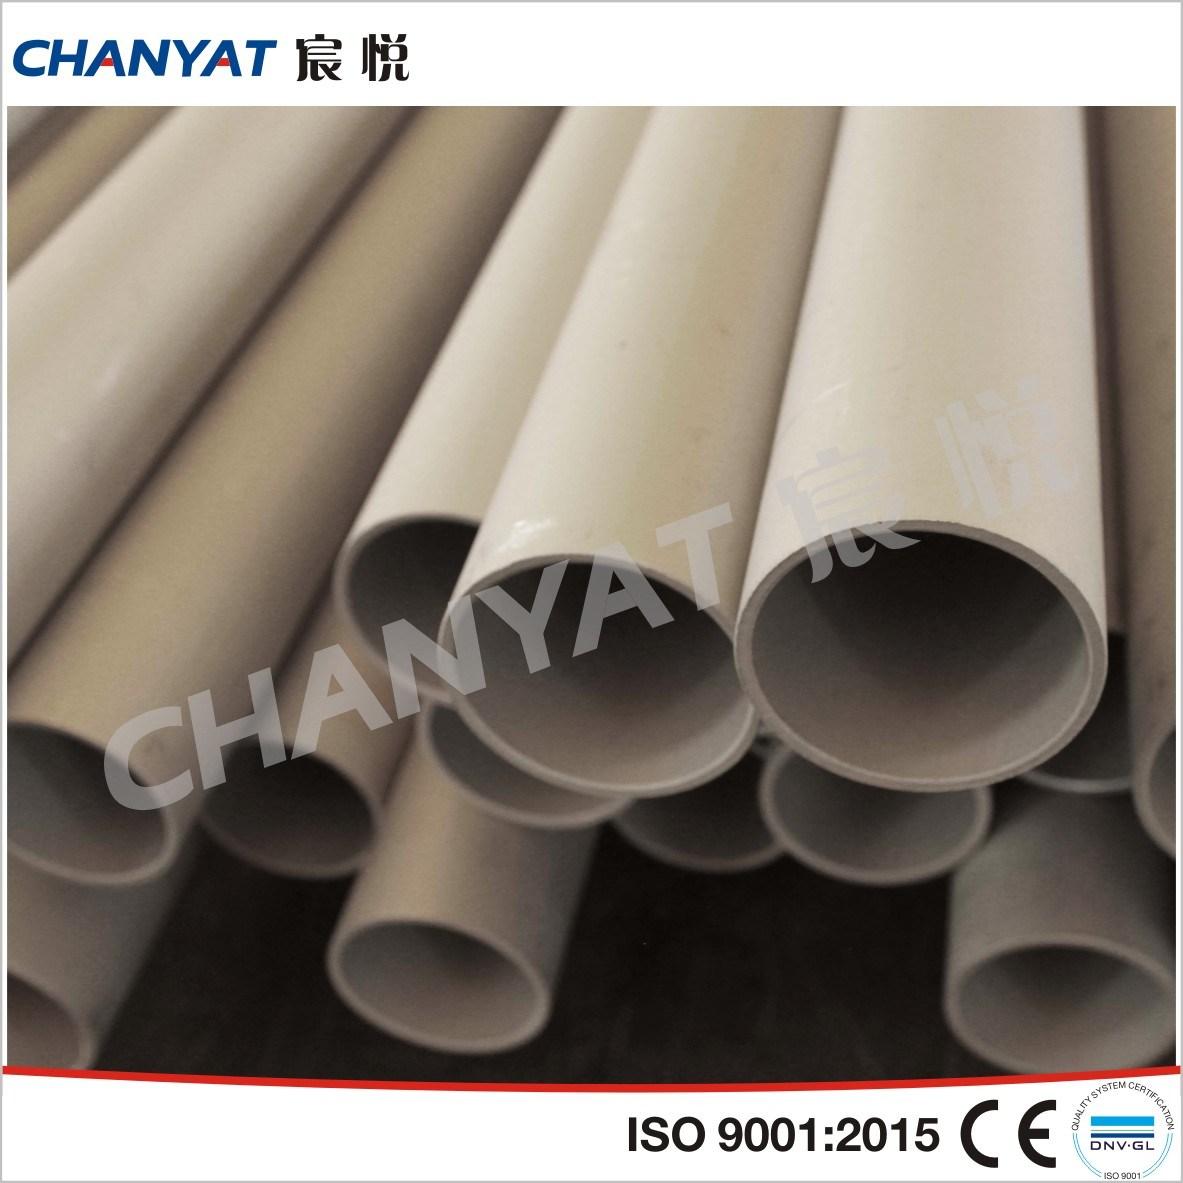 Seamless Pipe and Tube (ASTM B210, B241, B234)